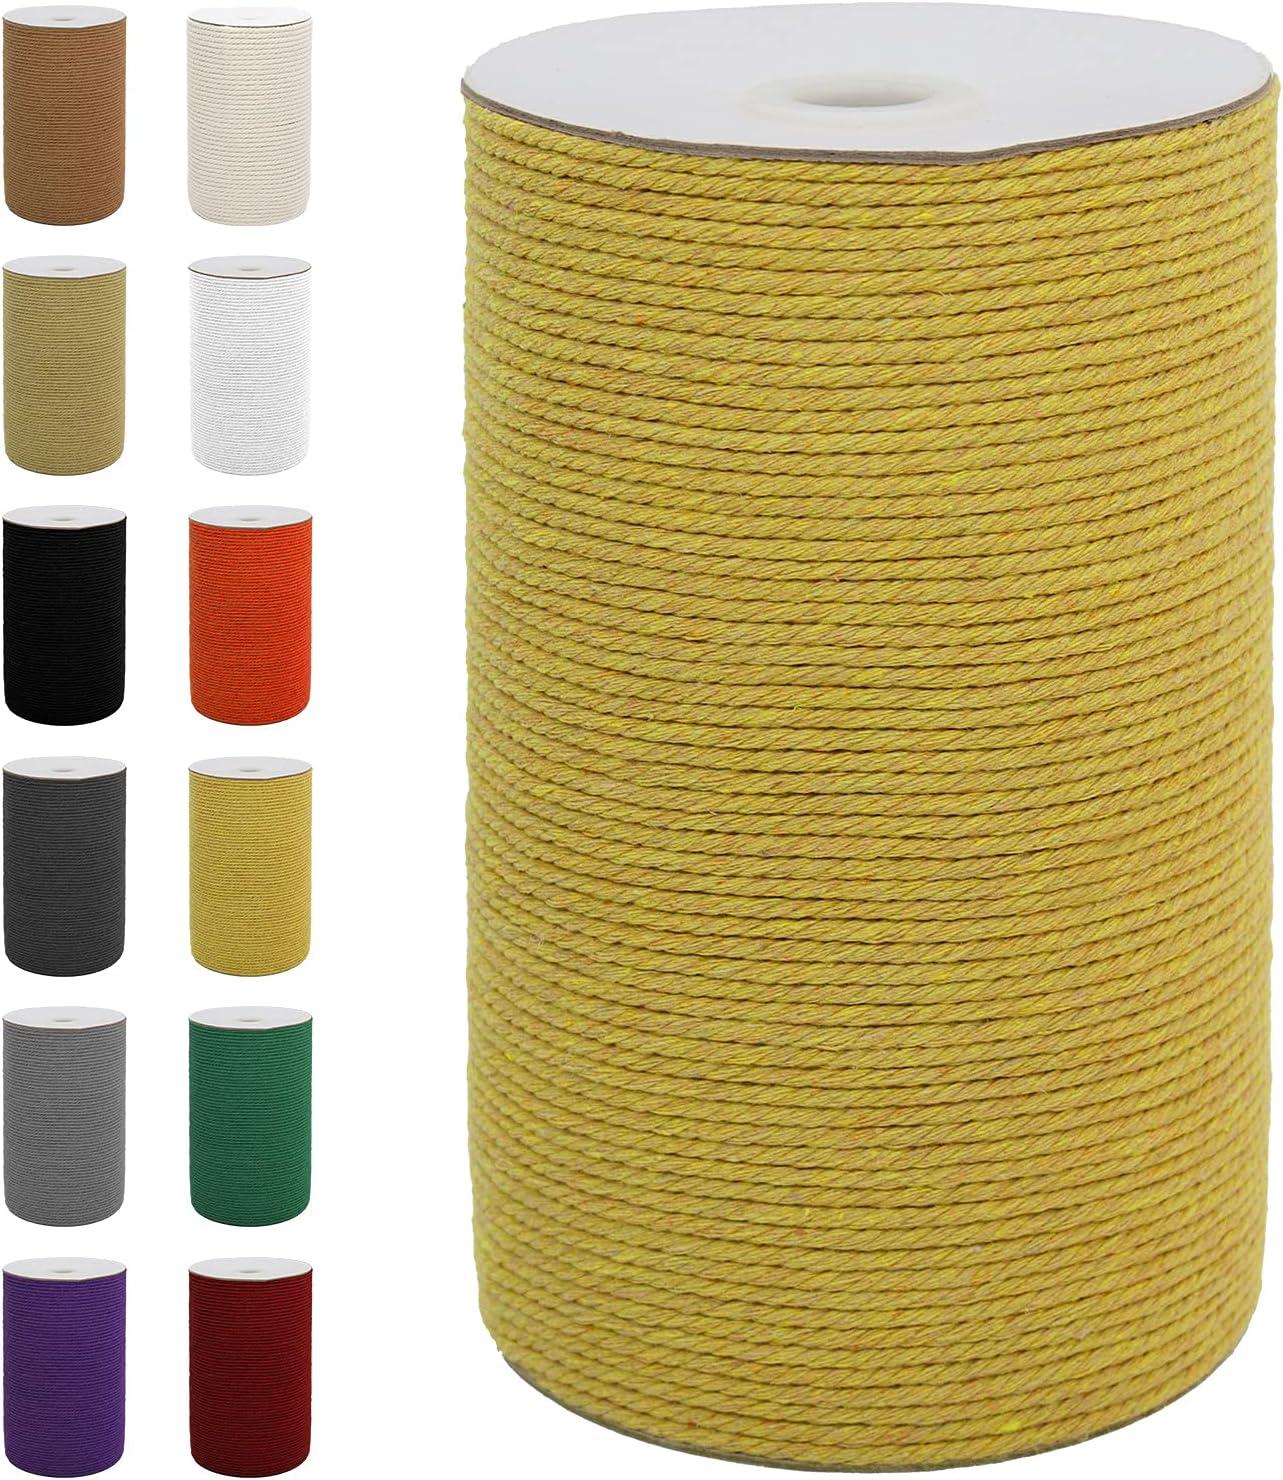 SUNTQ Macrame Cord 3mm 4 Max 71% OFF Strand Rope Cotton 24 Twisted mart